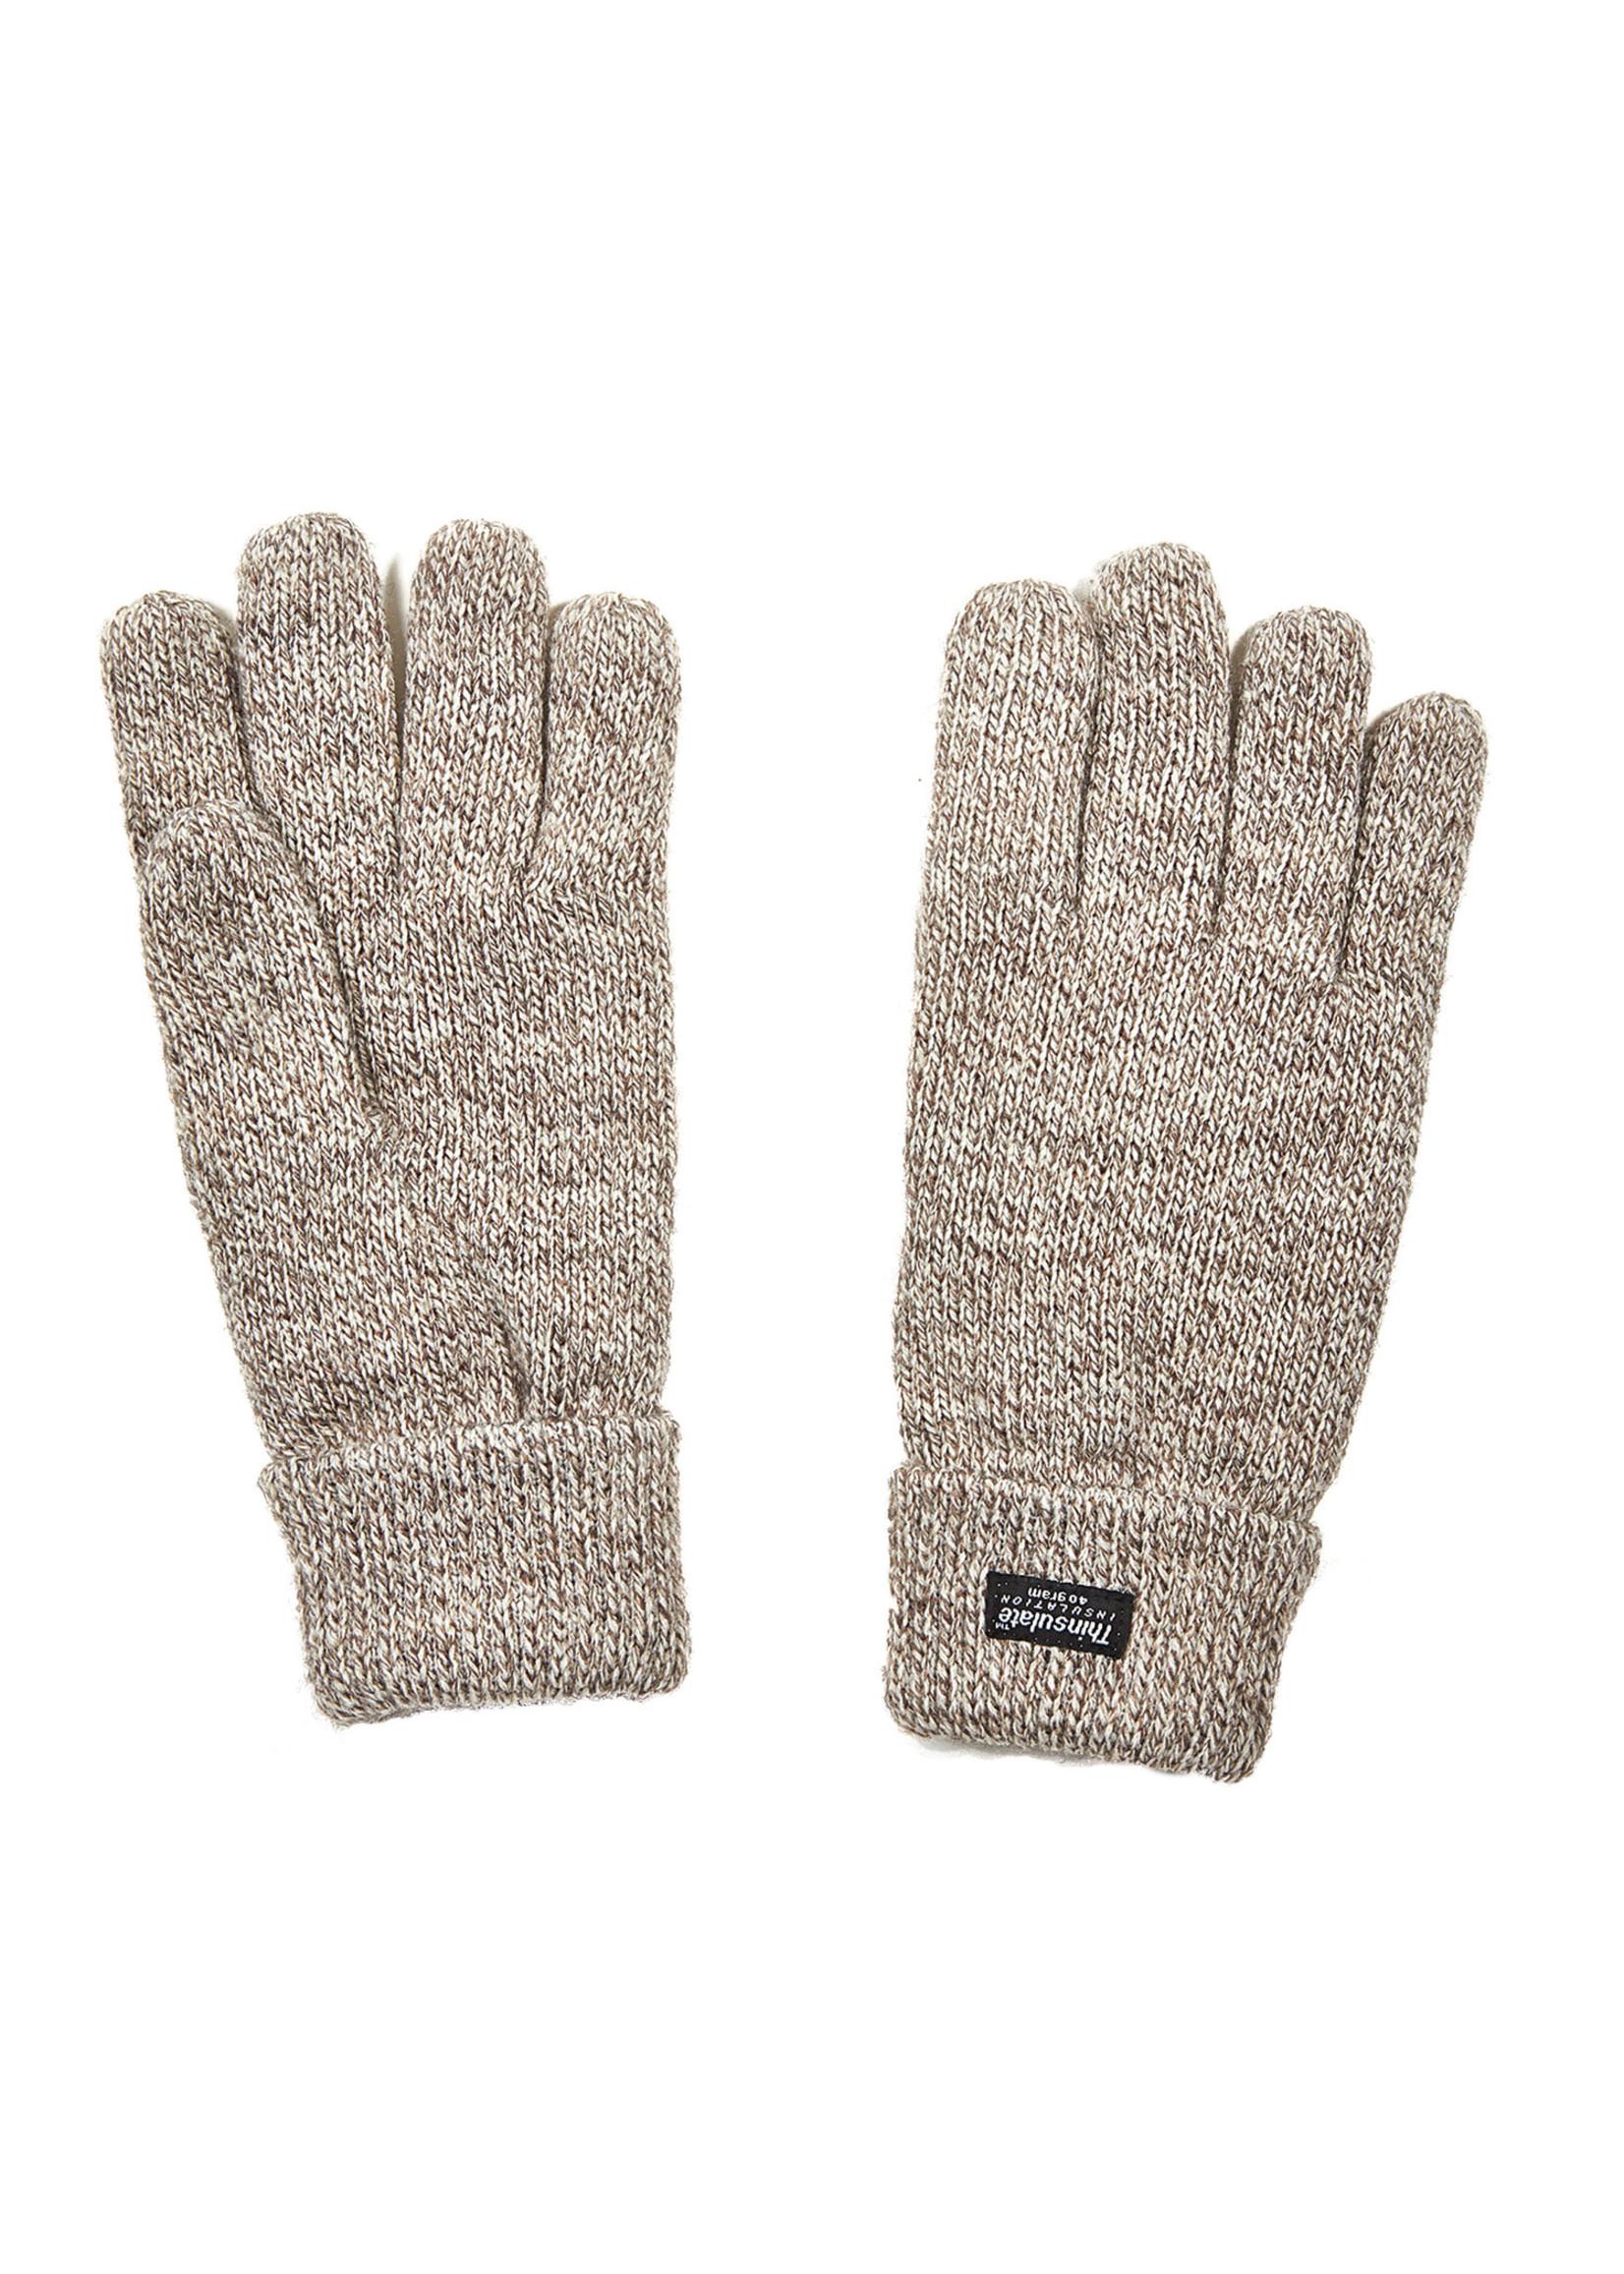 Stetson Marquette Thinsulate Winter Gloves